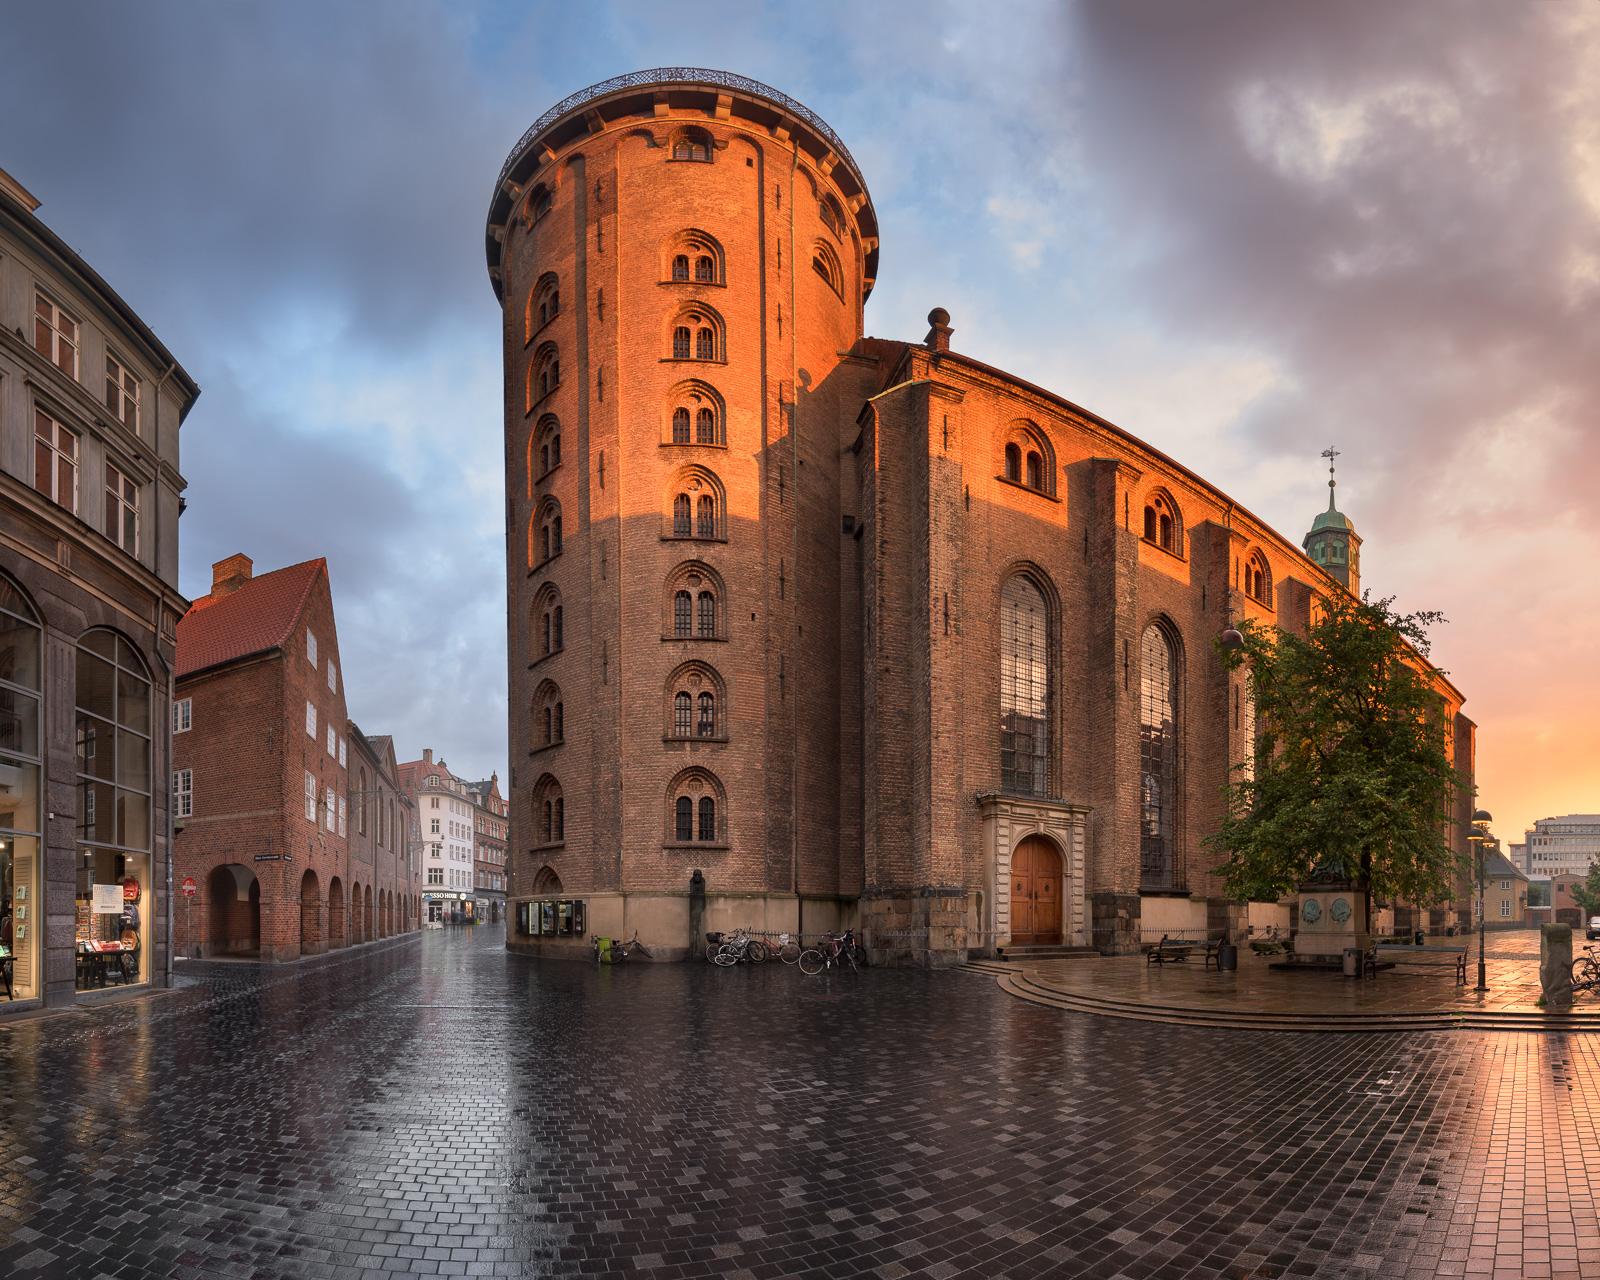 Panorama of the Round Tower in the Morning, Copenhagen, Denmark.jpg